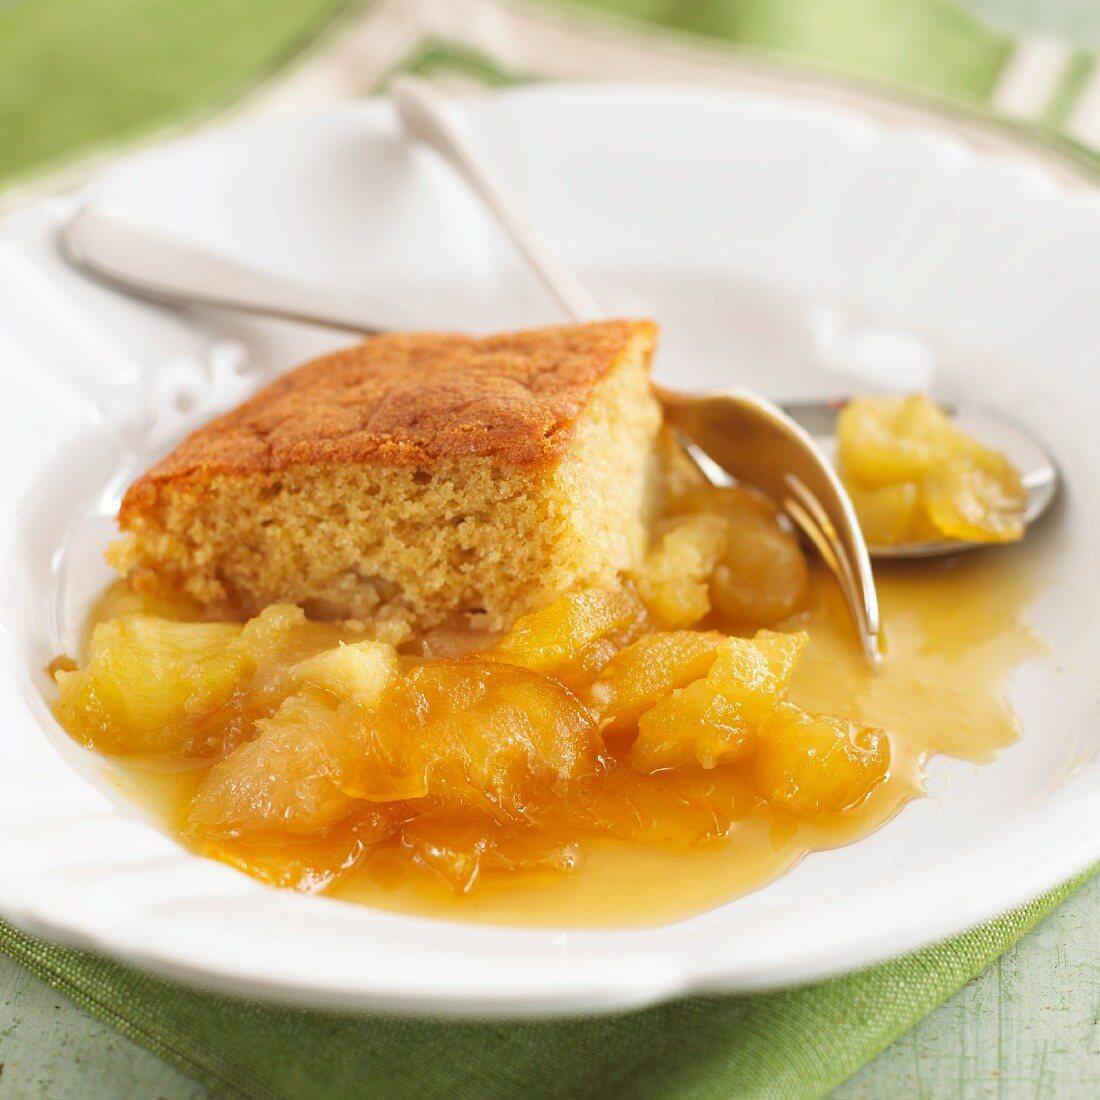 Toffee-apple pudding (England)